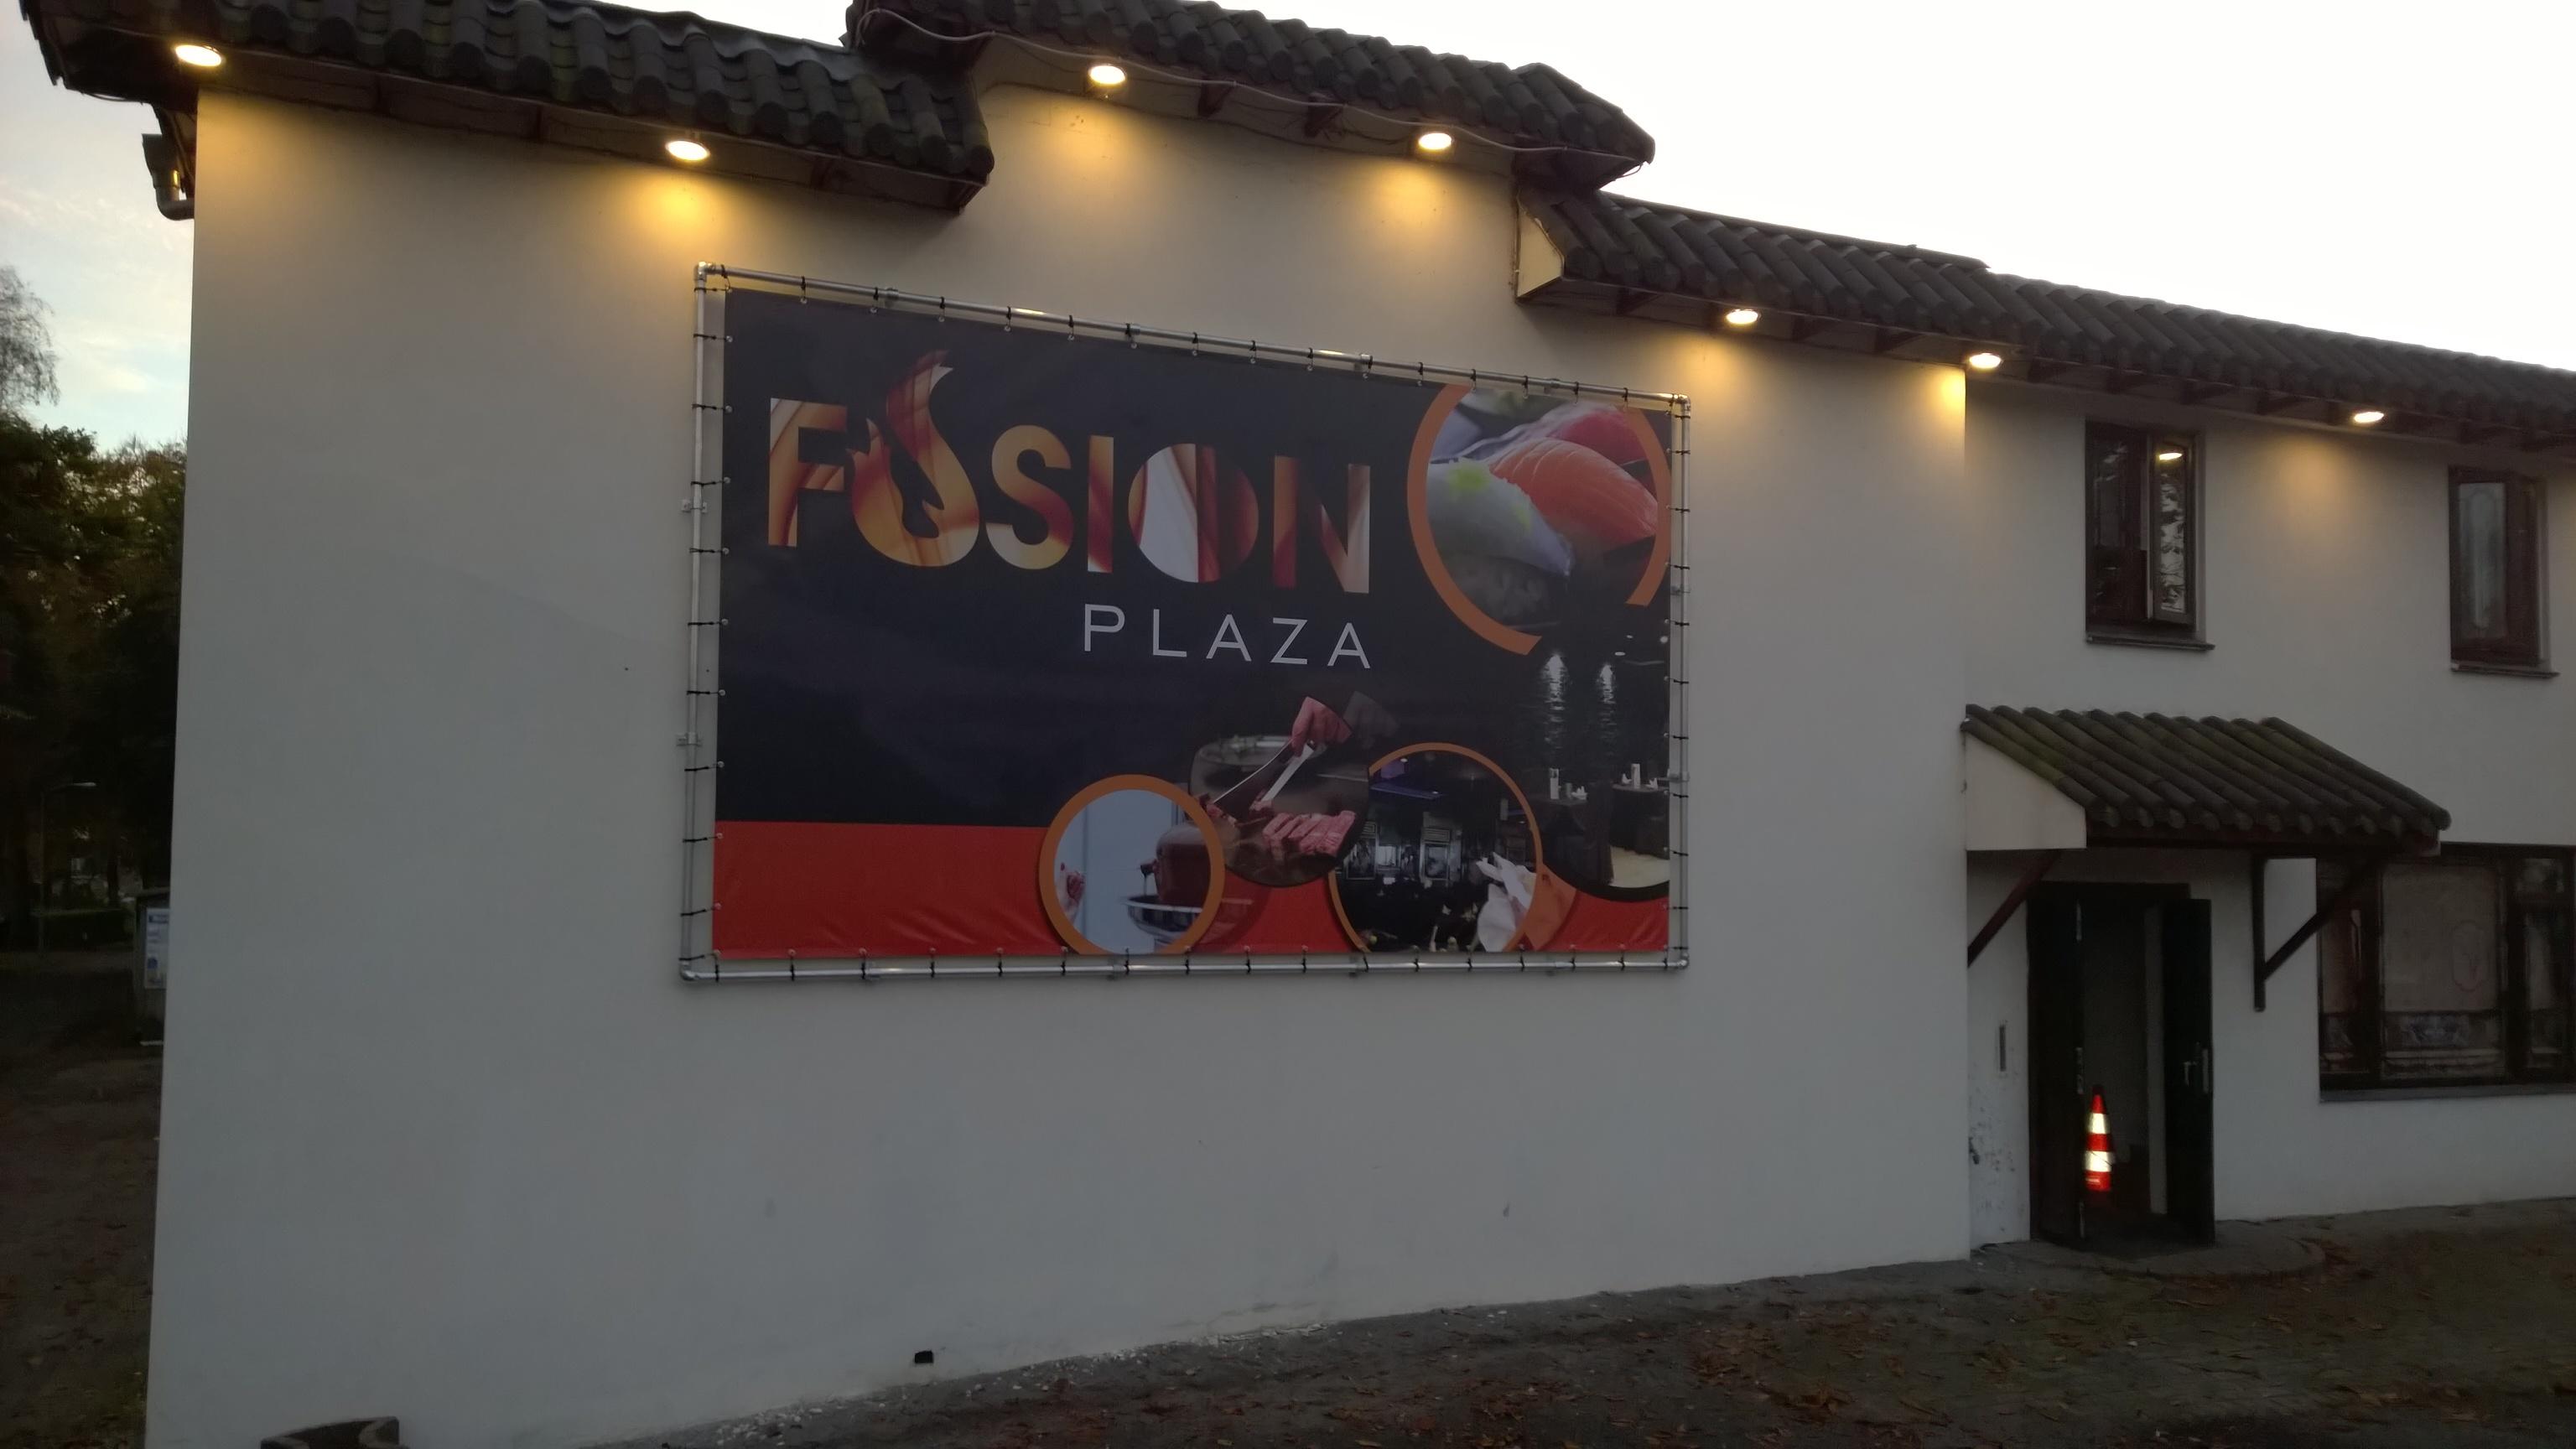 Fusion plaza